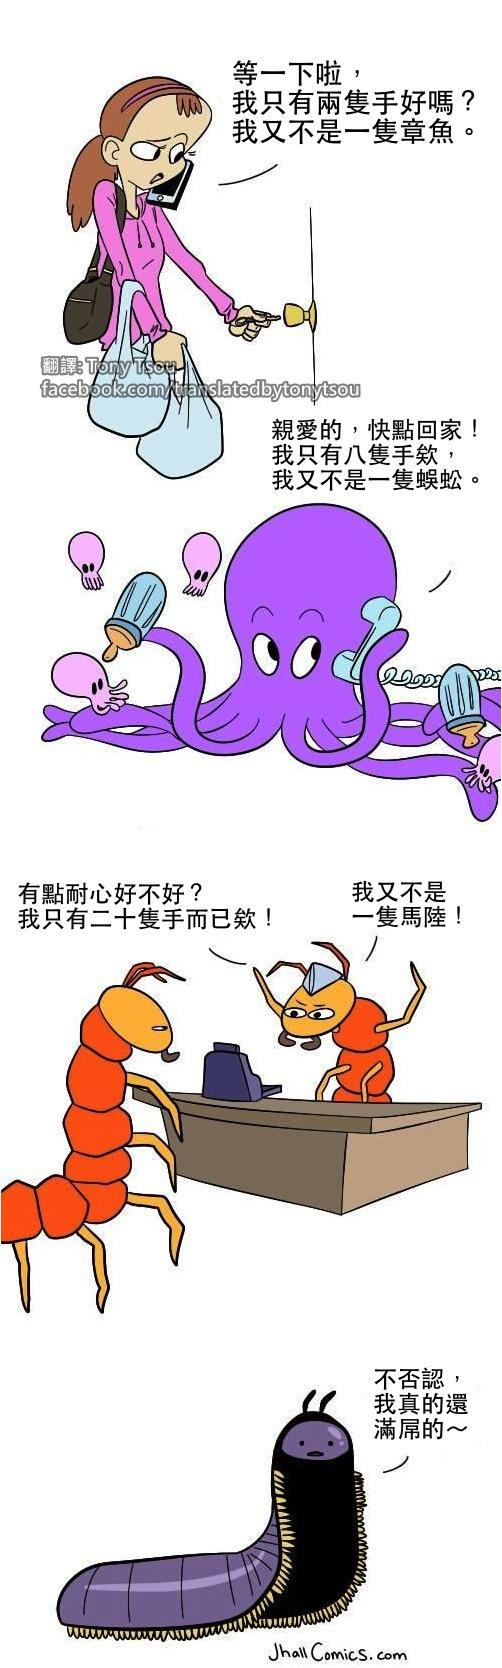 ManOctopus